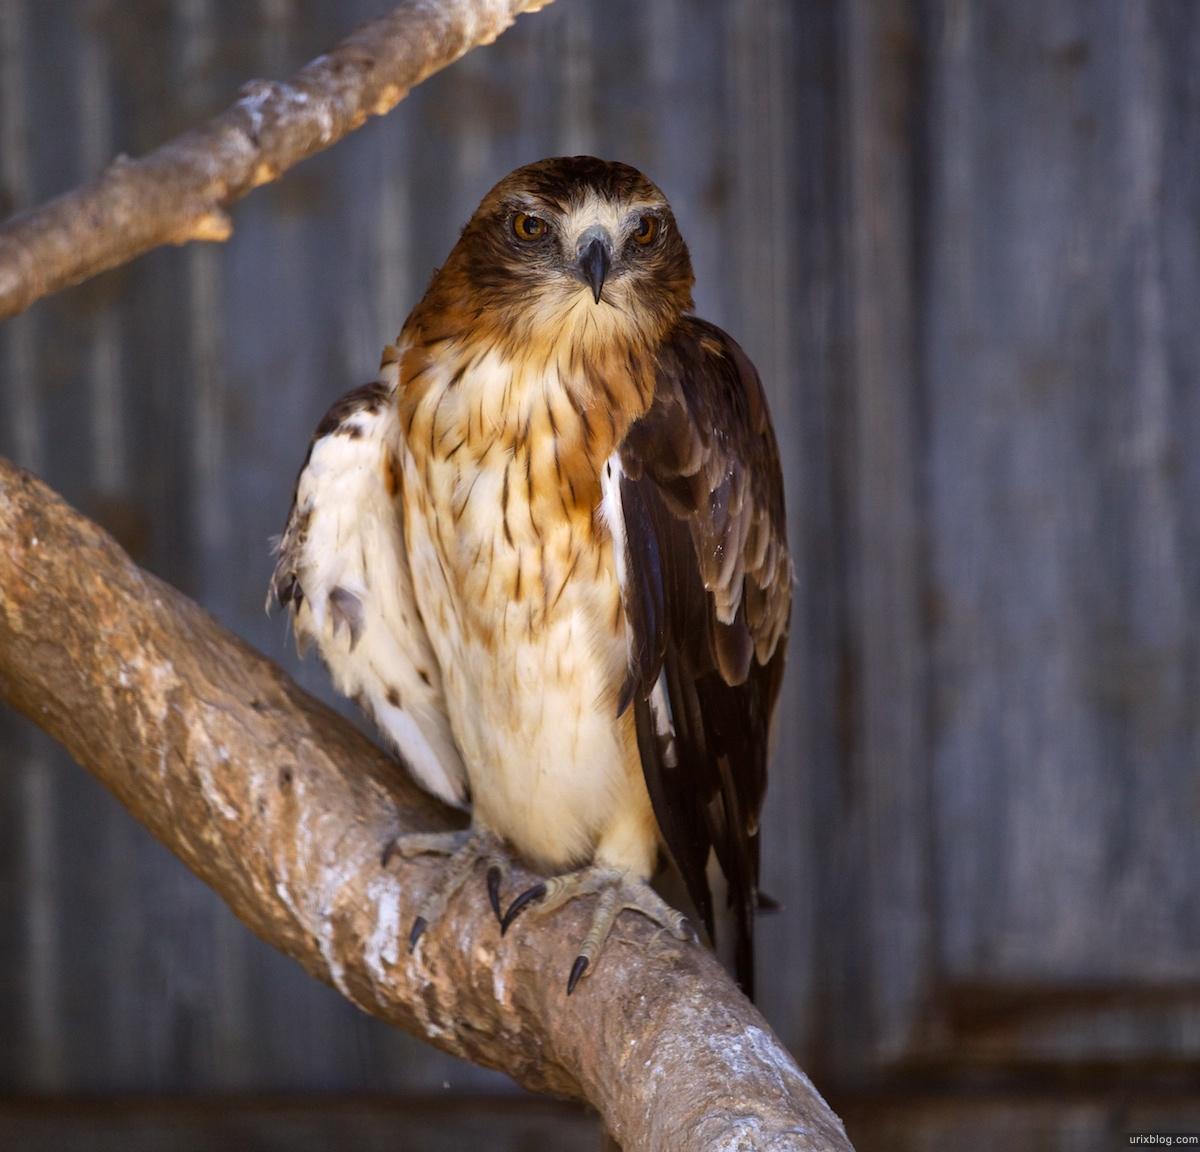 2011 South Australia, Kangaroo Island, Остров Кенгуру, Южная Австралия, Parndana Wildlife Park, орёл, eagle